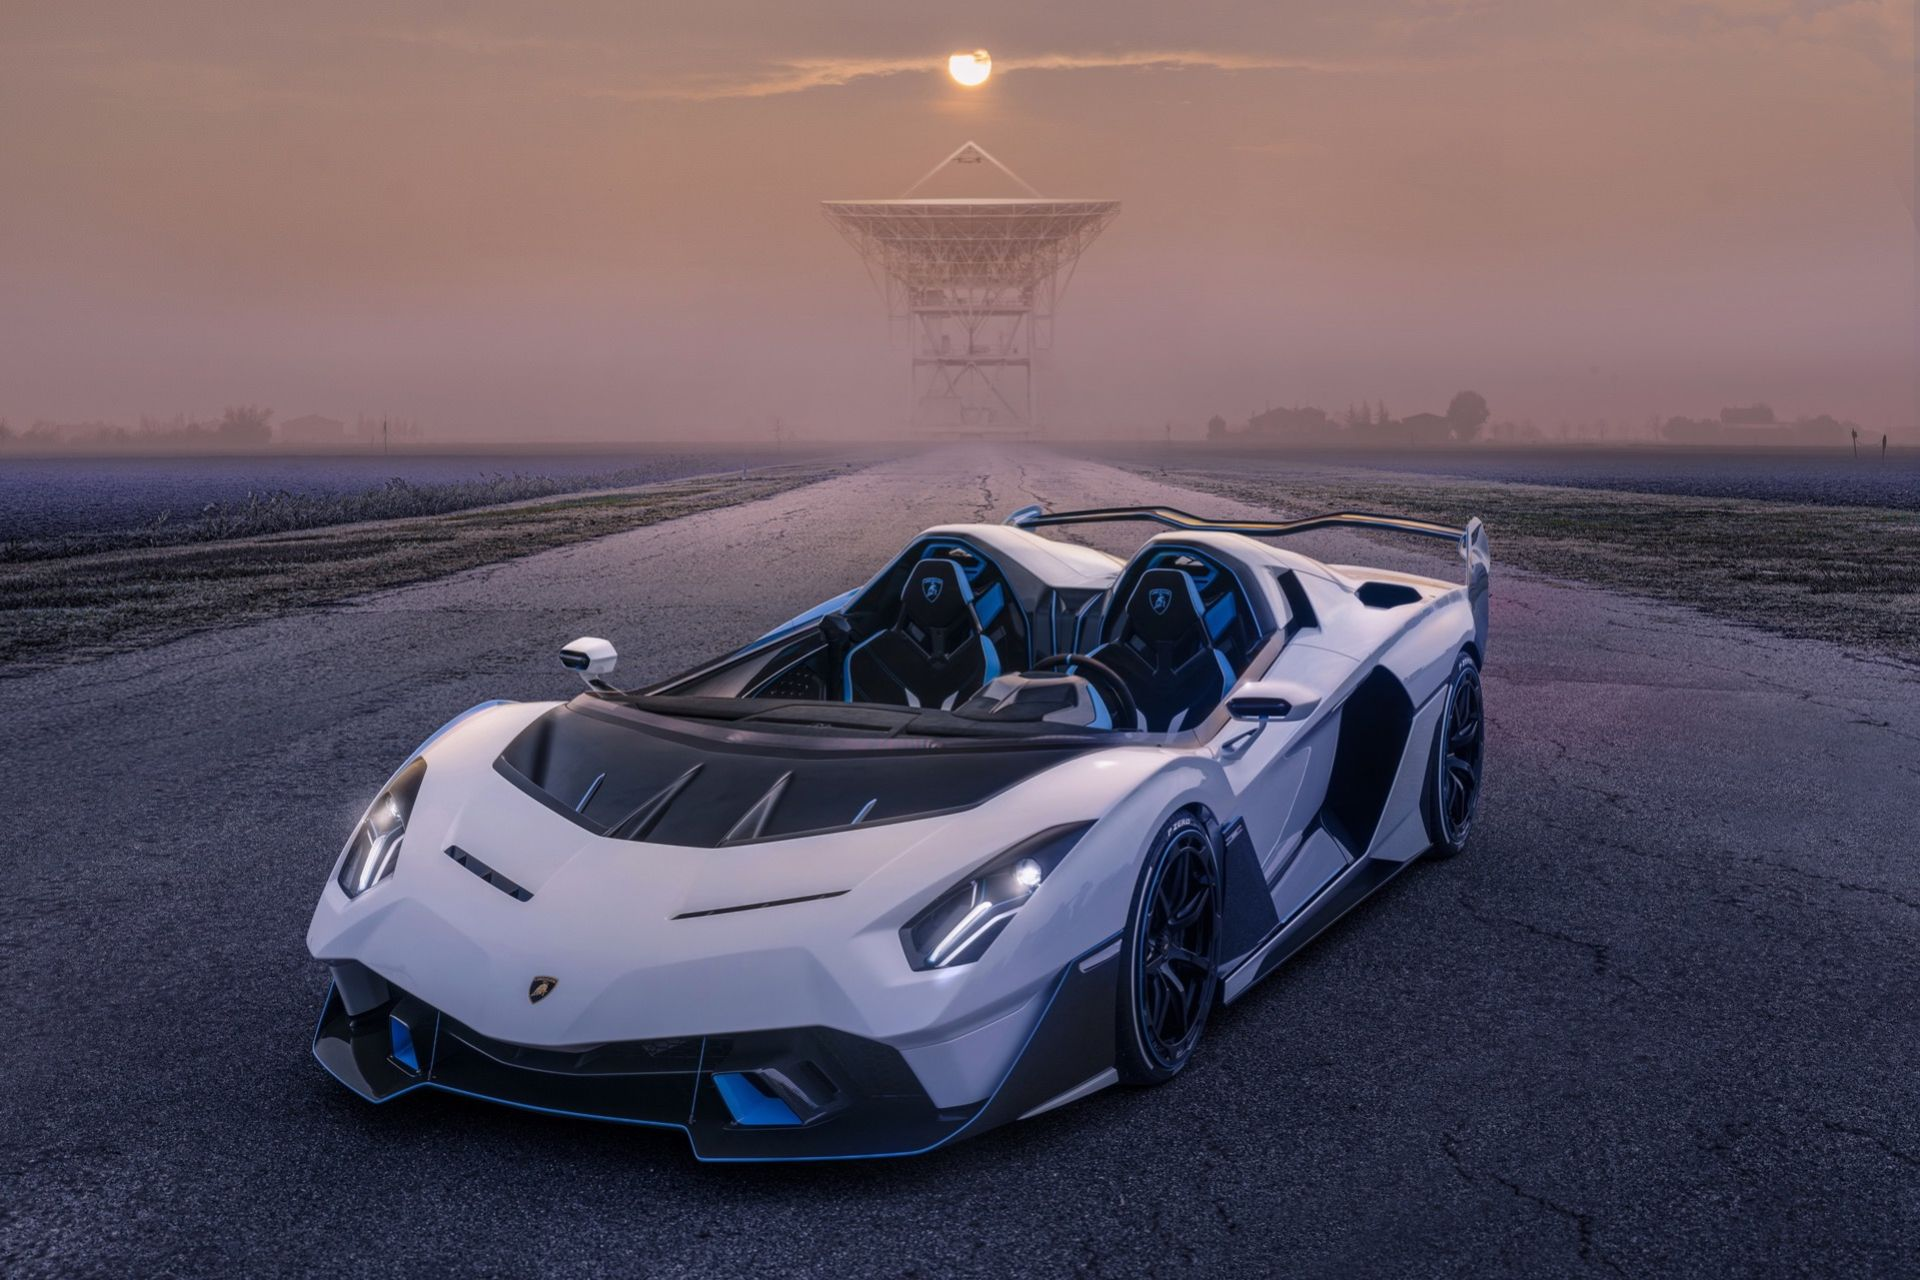 Lamborghini presenterar vindrutelösa SC20